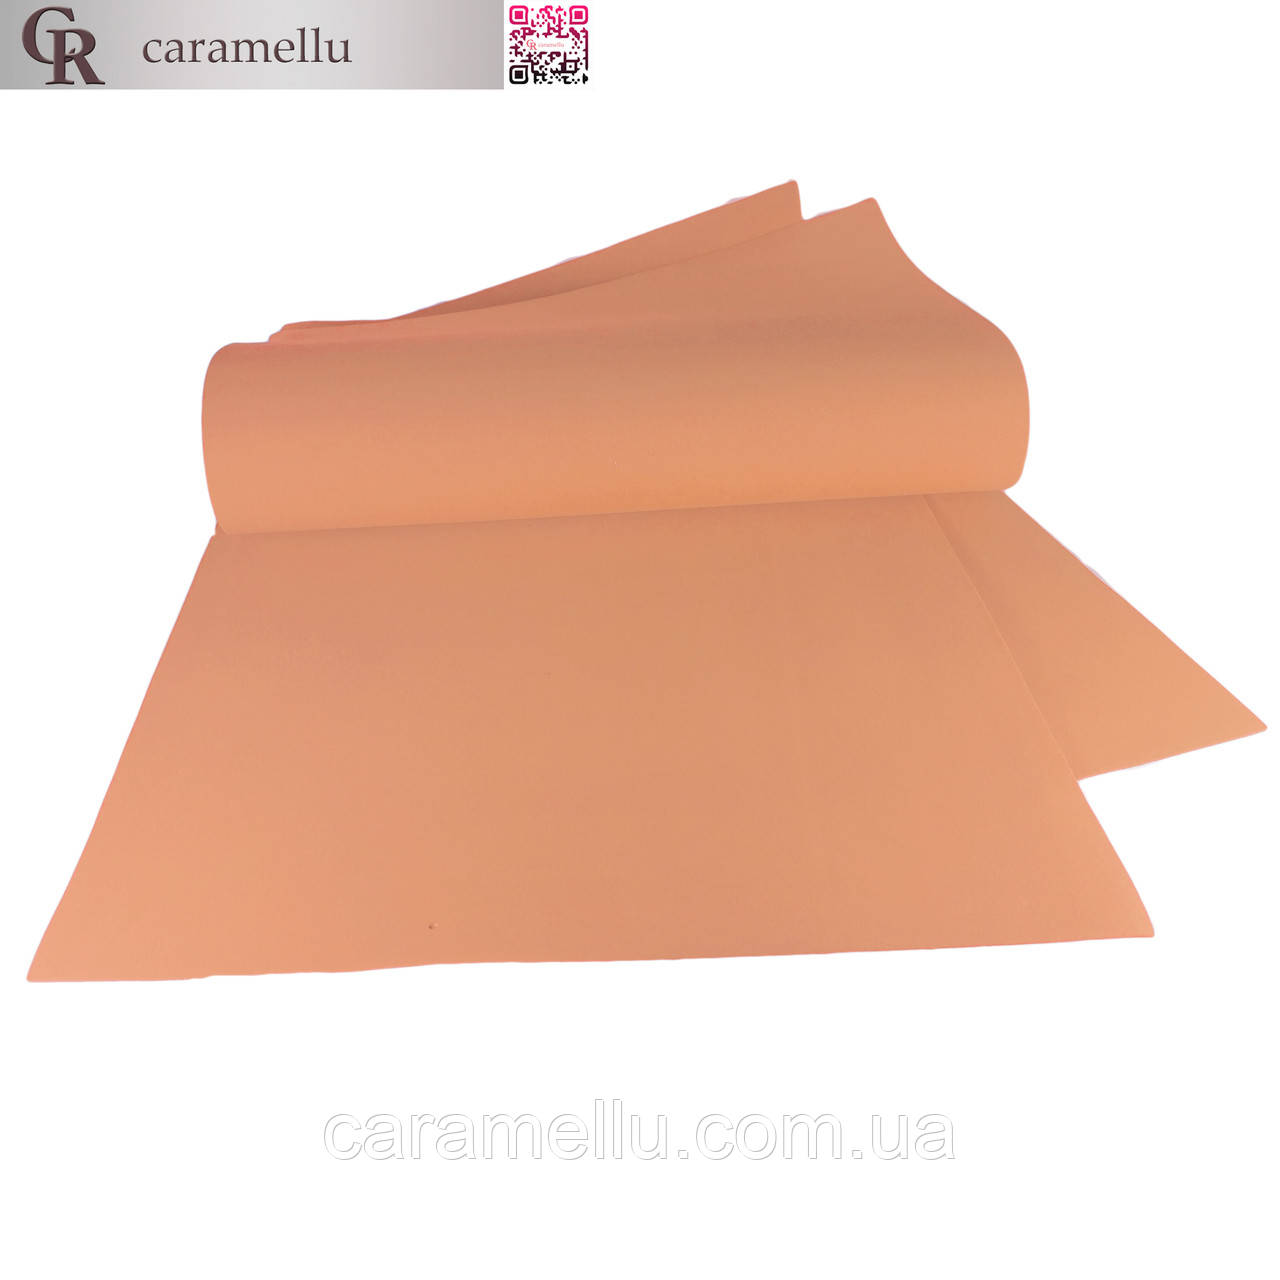 Фоамиран иранский 138, Коралл, 1мм, 70х60см.